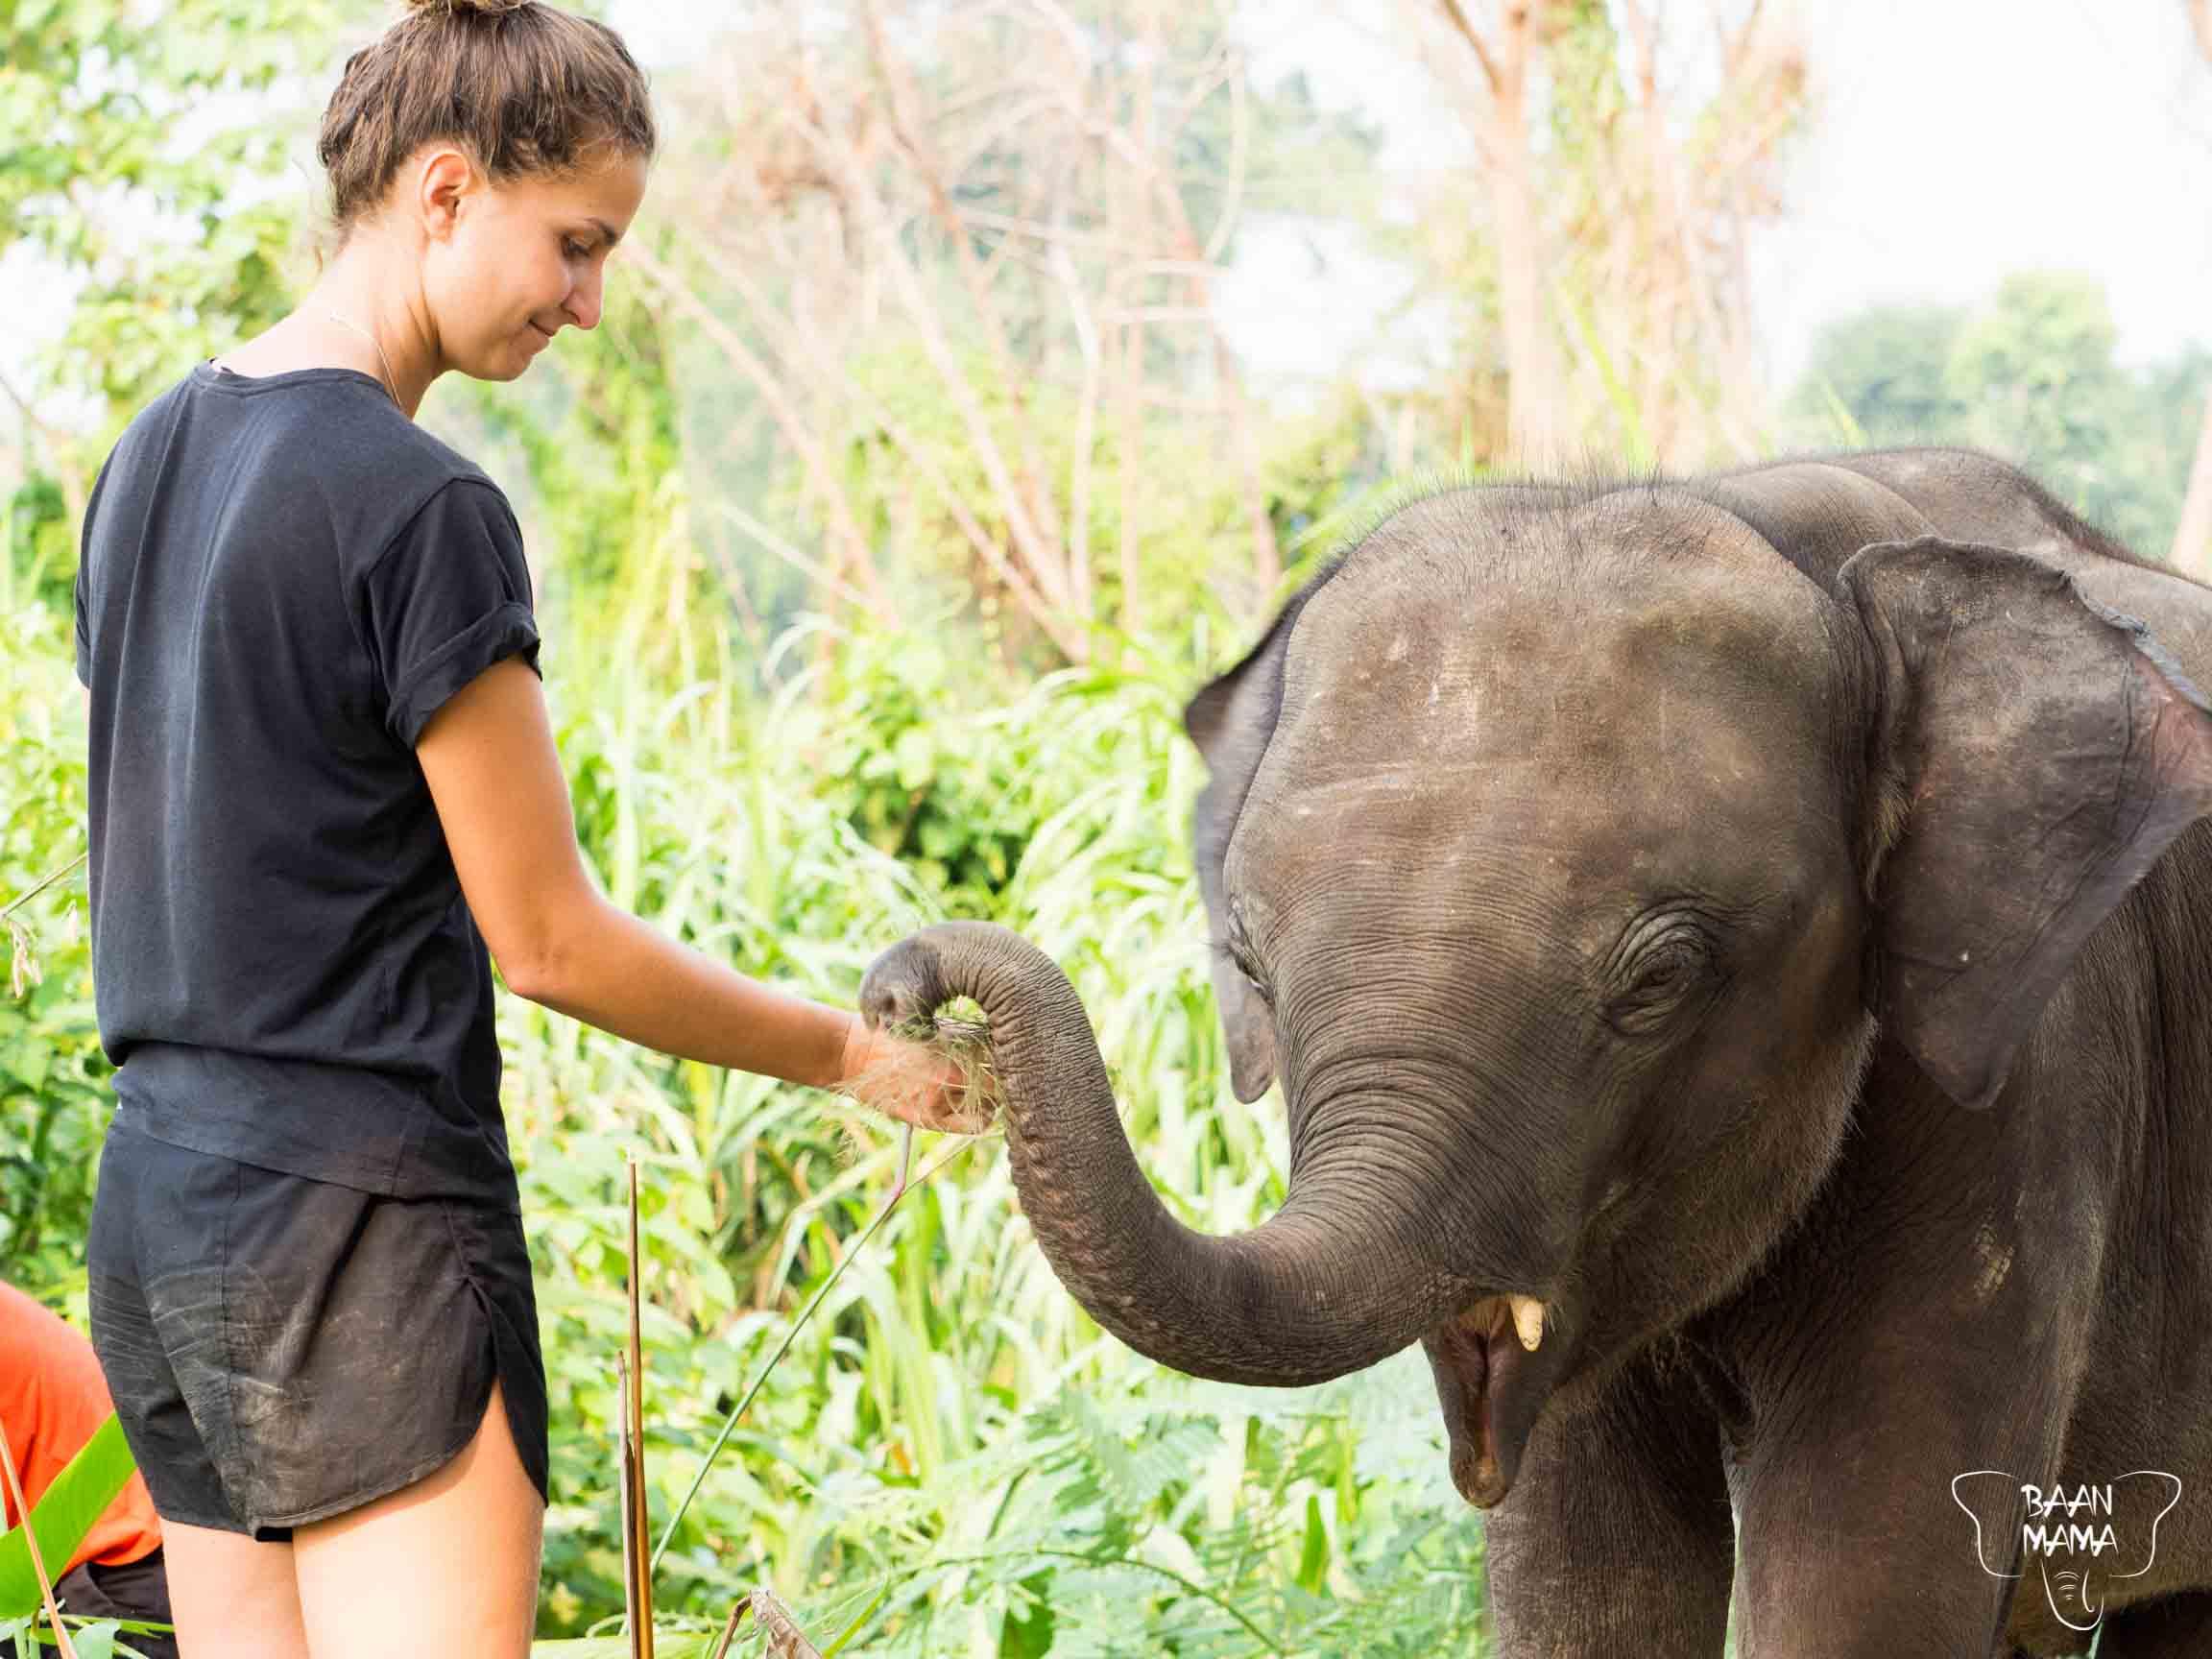 Volontariat 2019 Baan Mama Elephant Kanchanaburi Thailande